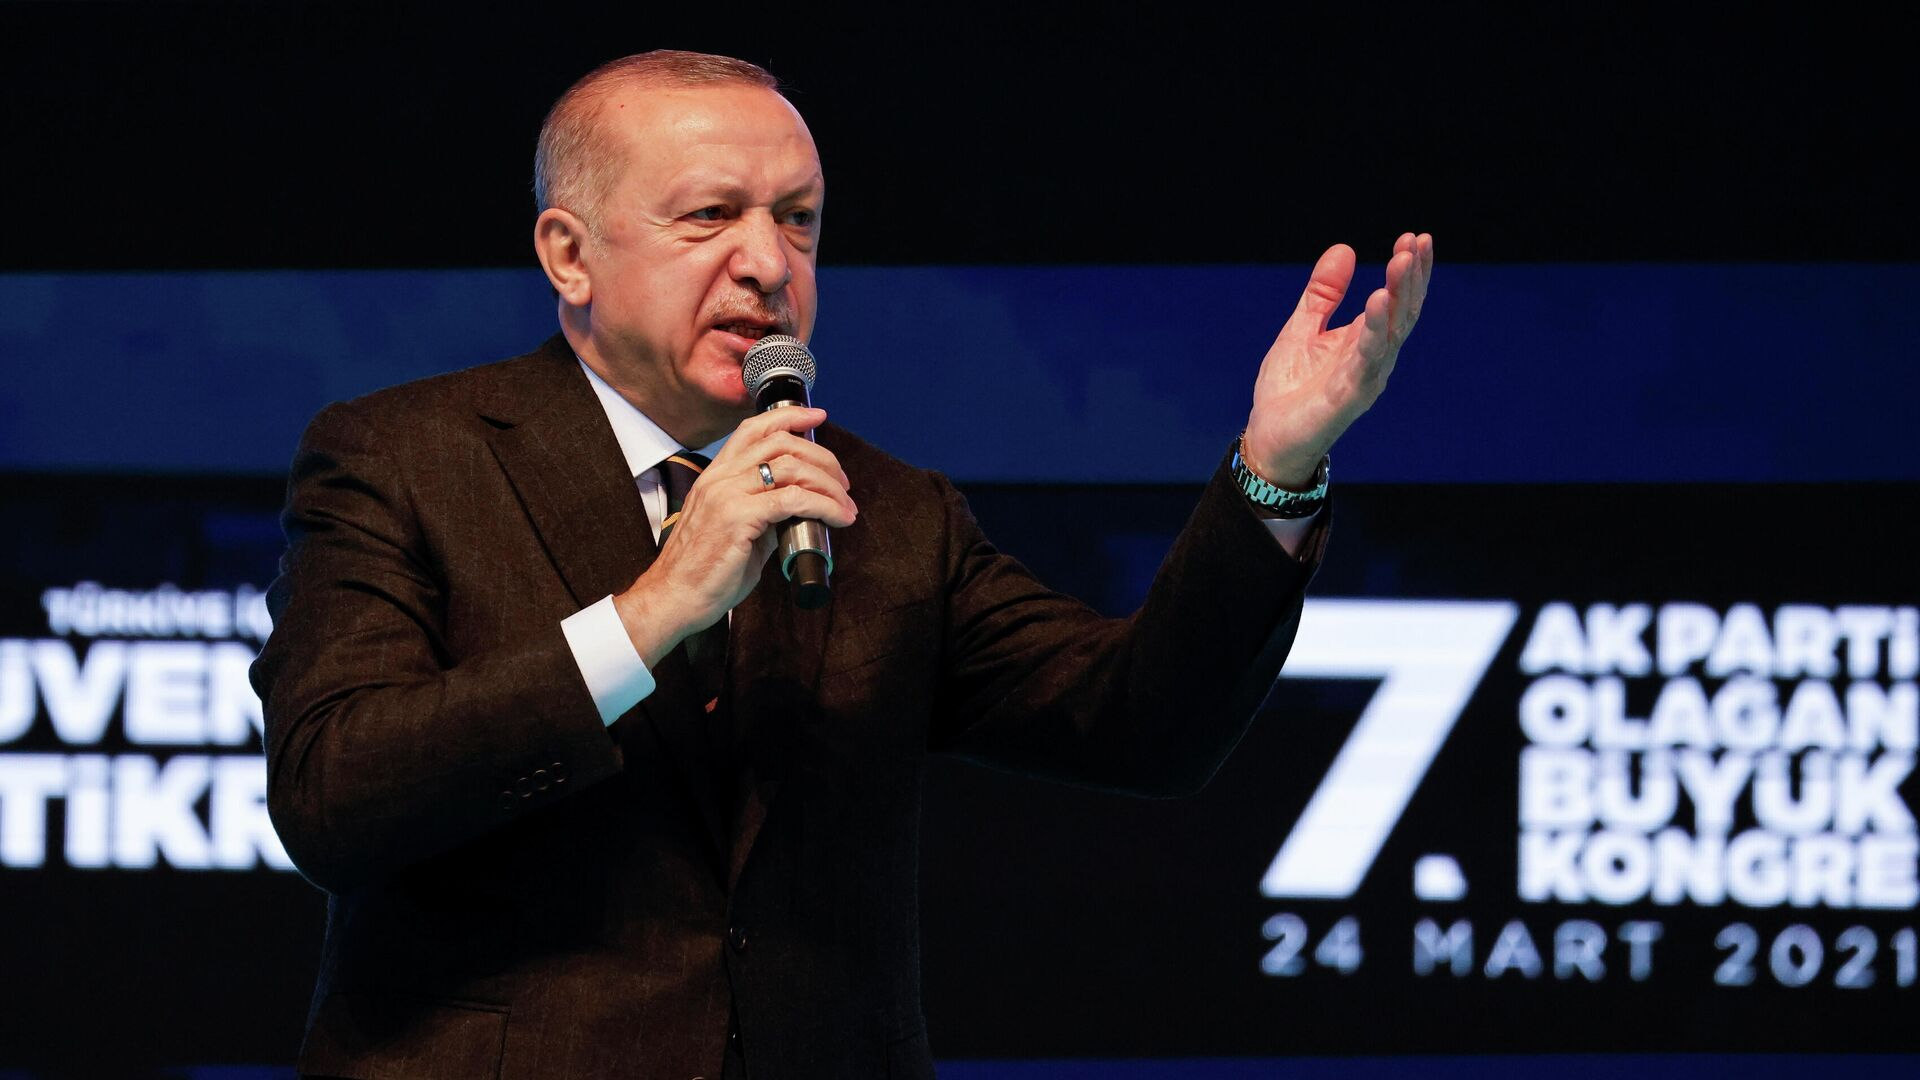 Recep Tayyip Erdogan, presidente turco - Sputnik Mundo, 1920, 24.03.2021